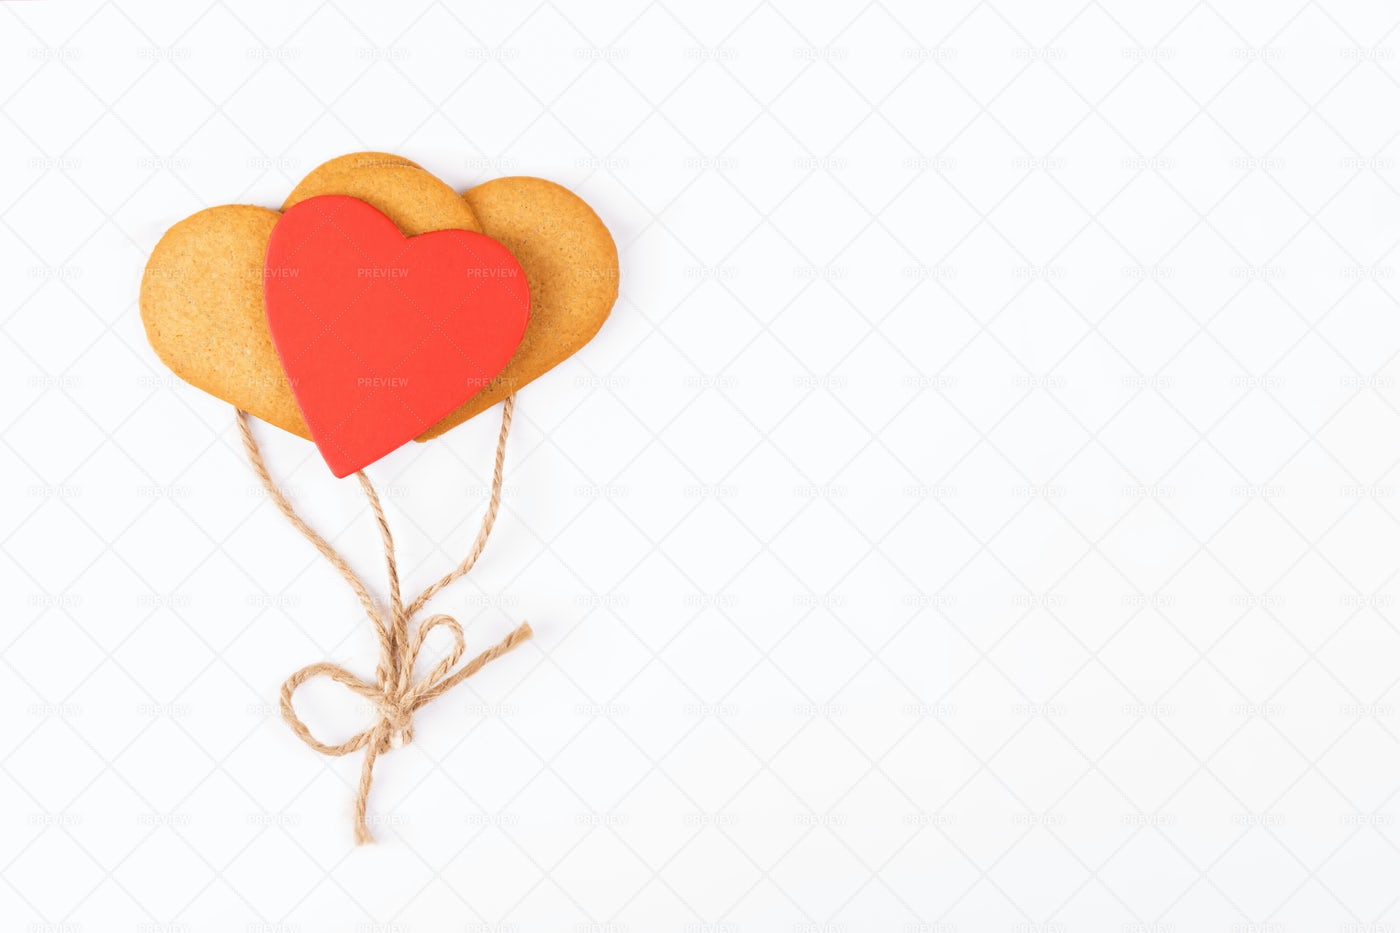 Heart-Shaped Balloon Cookies: Stock Photos